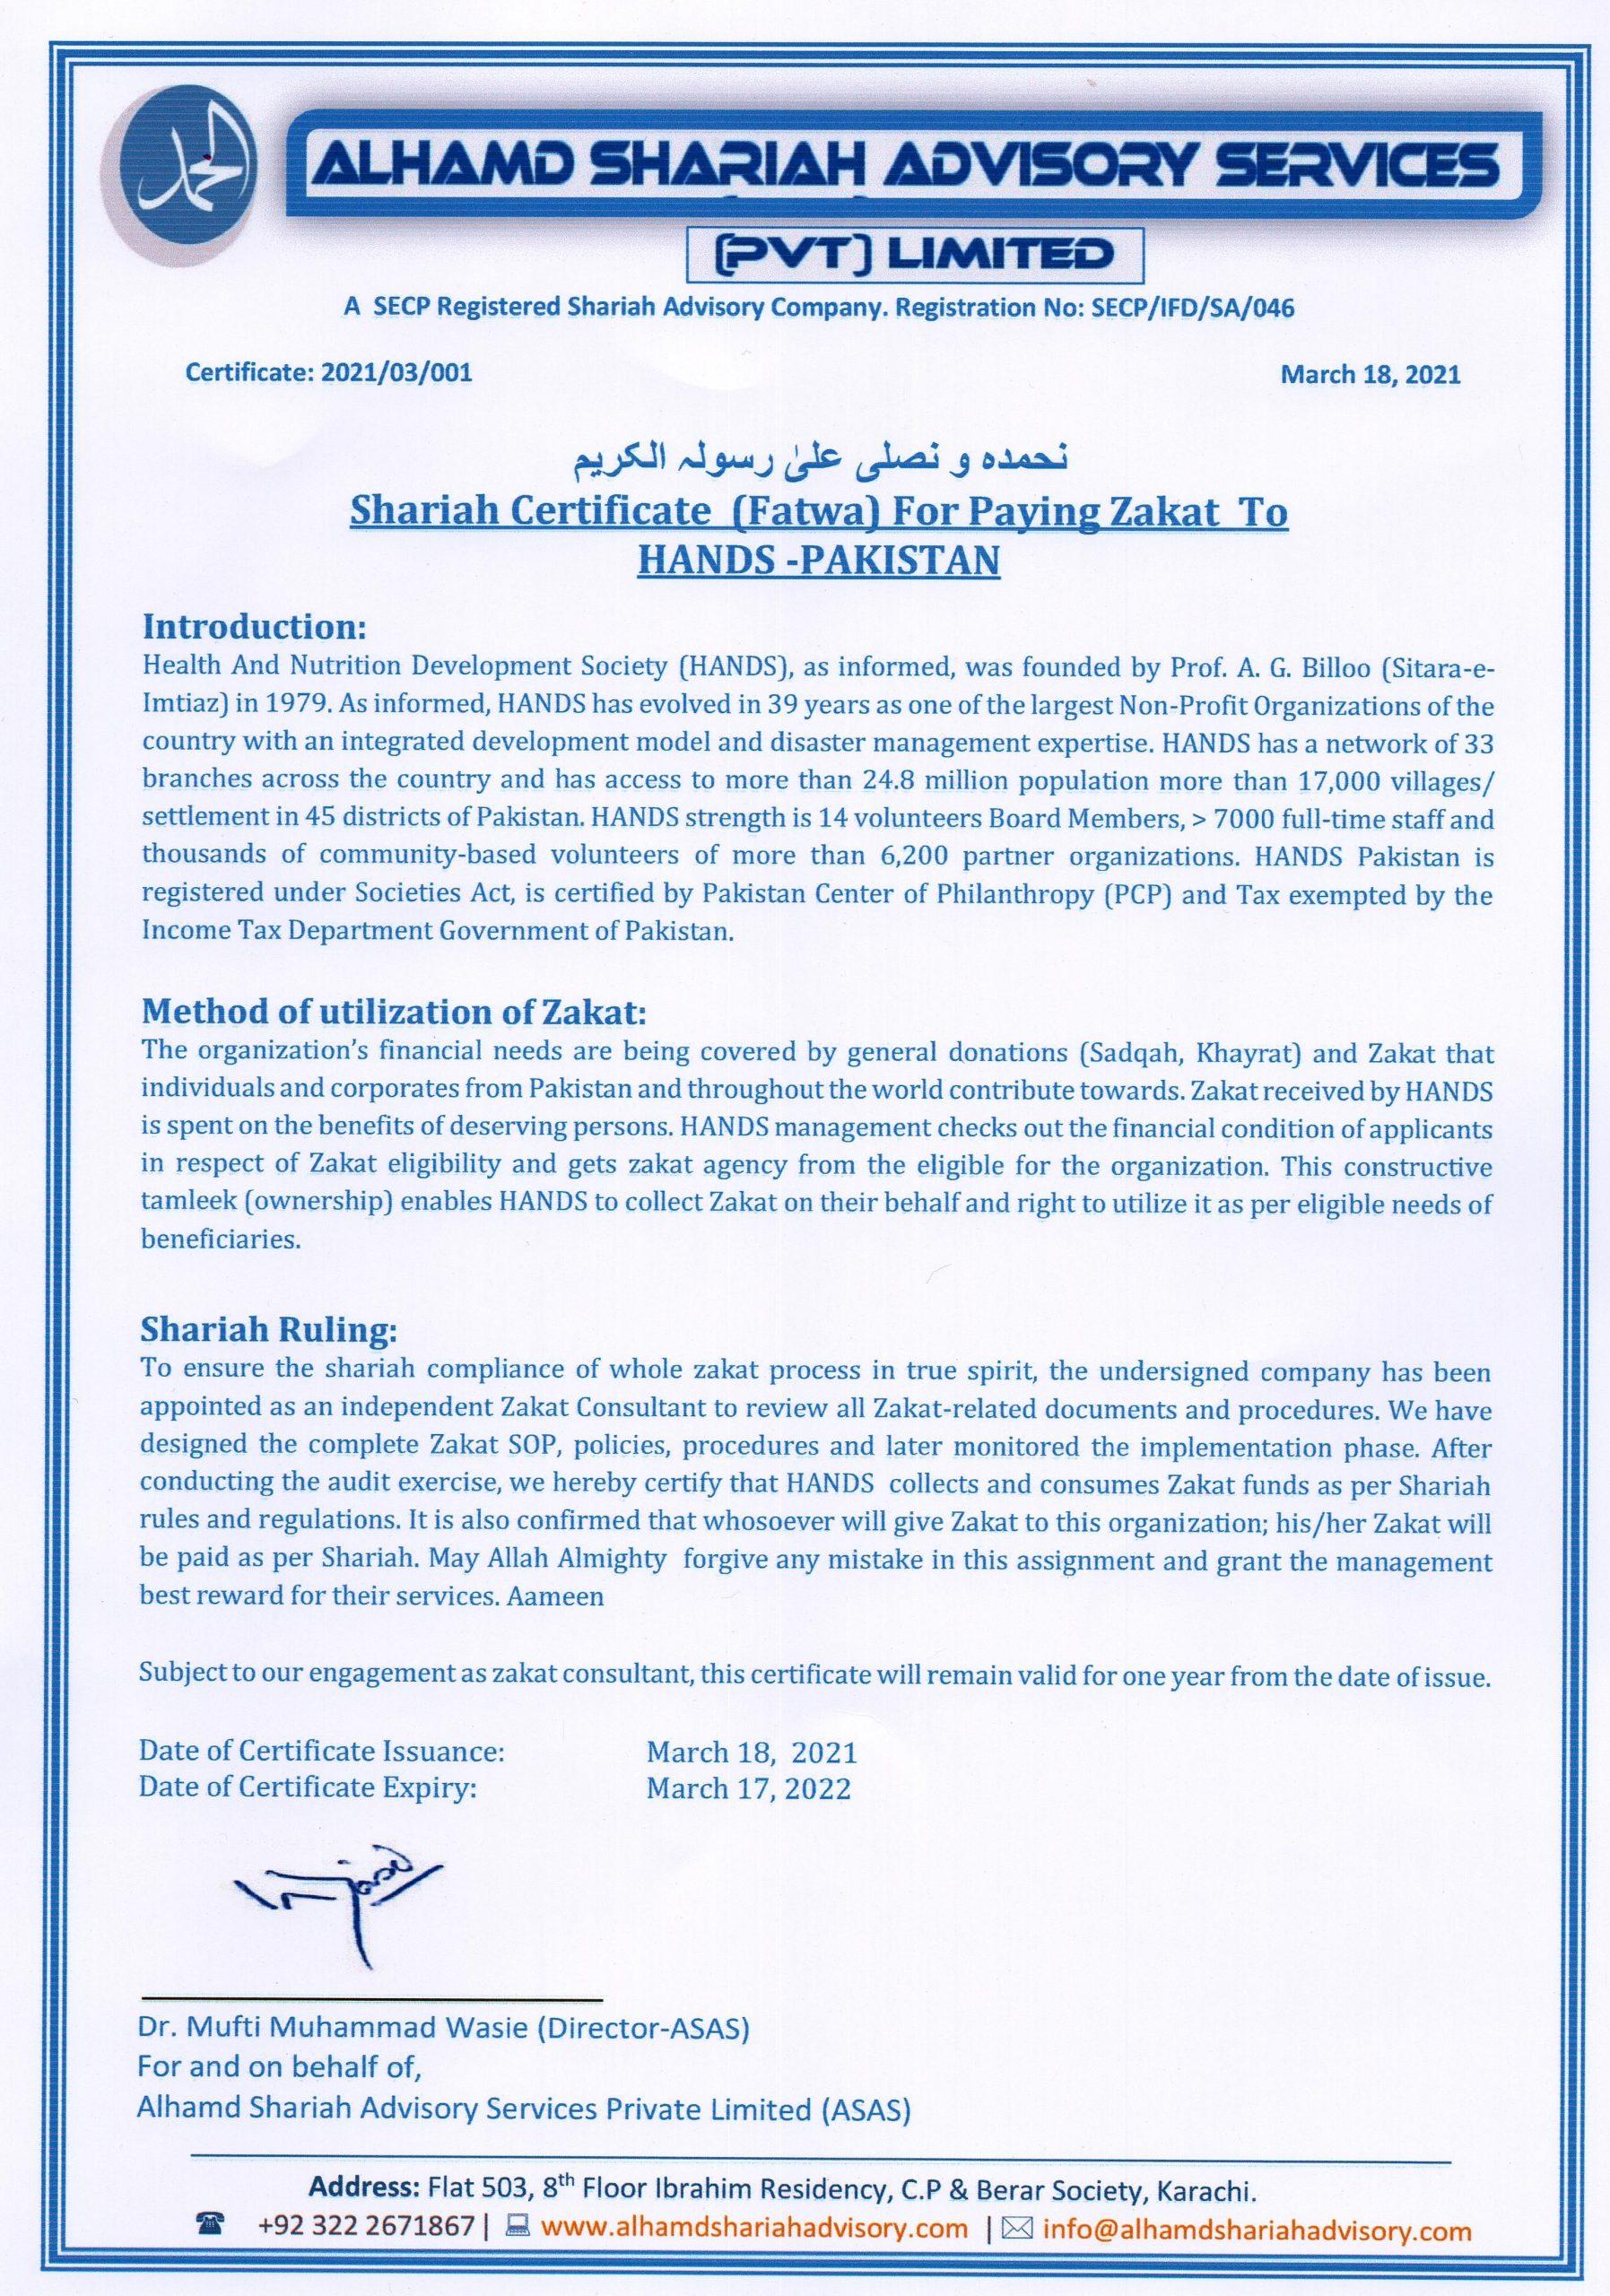 Alhamd Sharjah Advisory Service